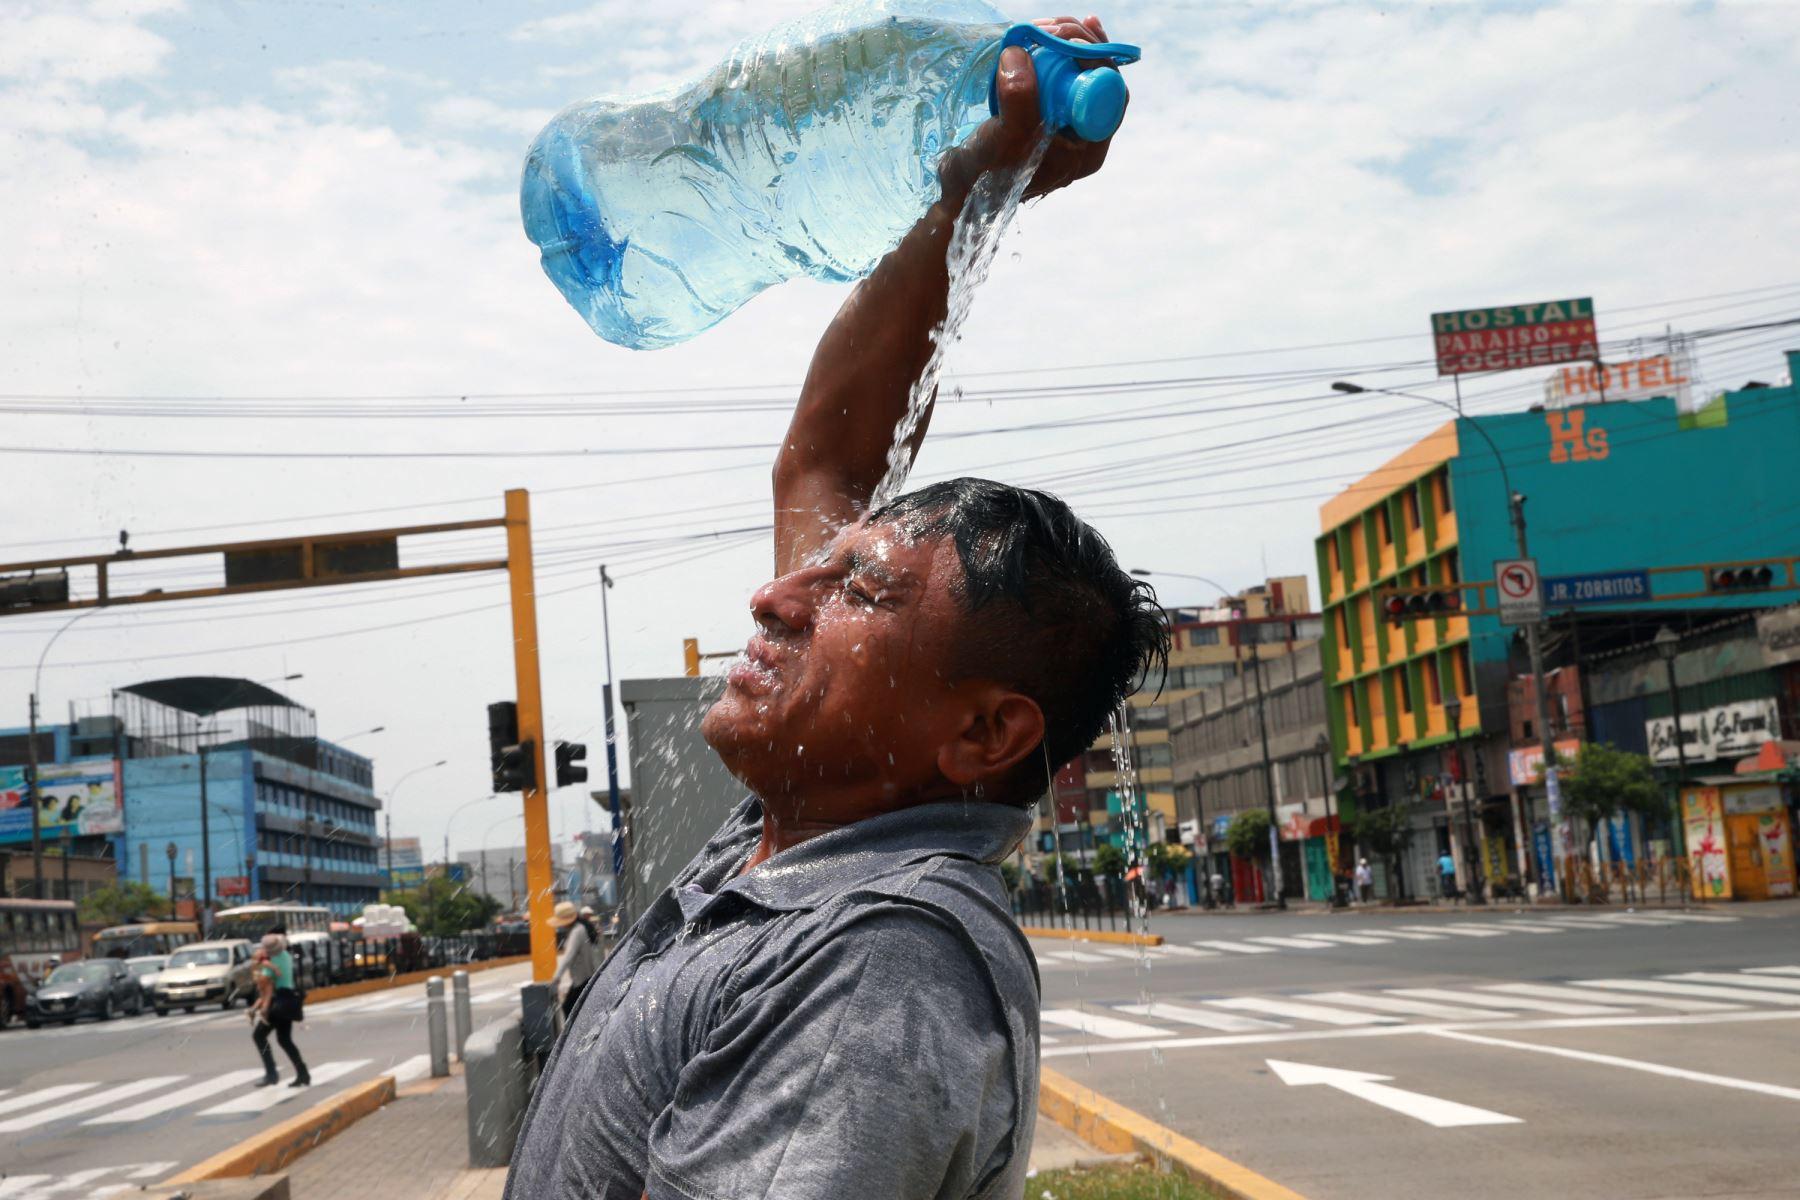 Hombre se hecha agua de una botella para soportan el incesante calor de Lima. Foto: ANDINA/Norman Córdova